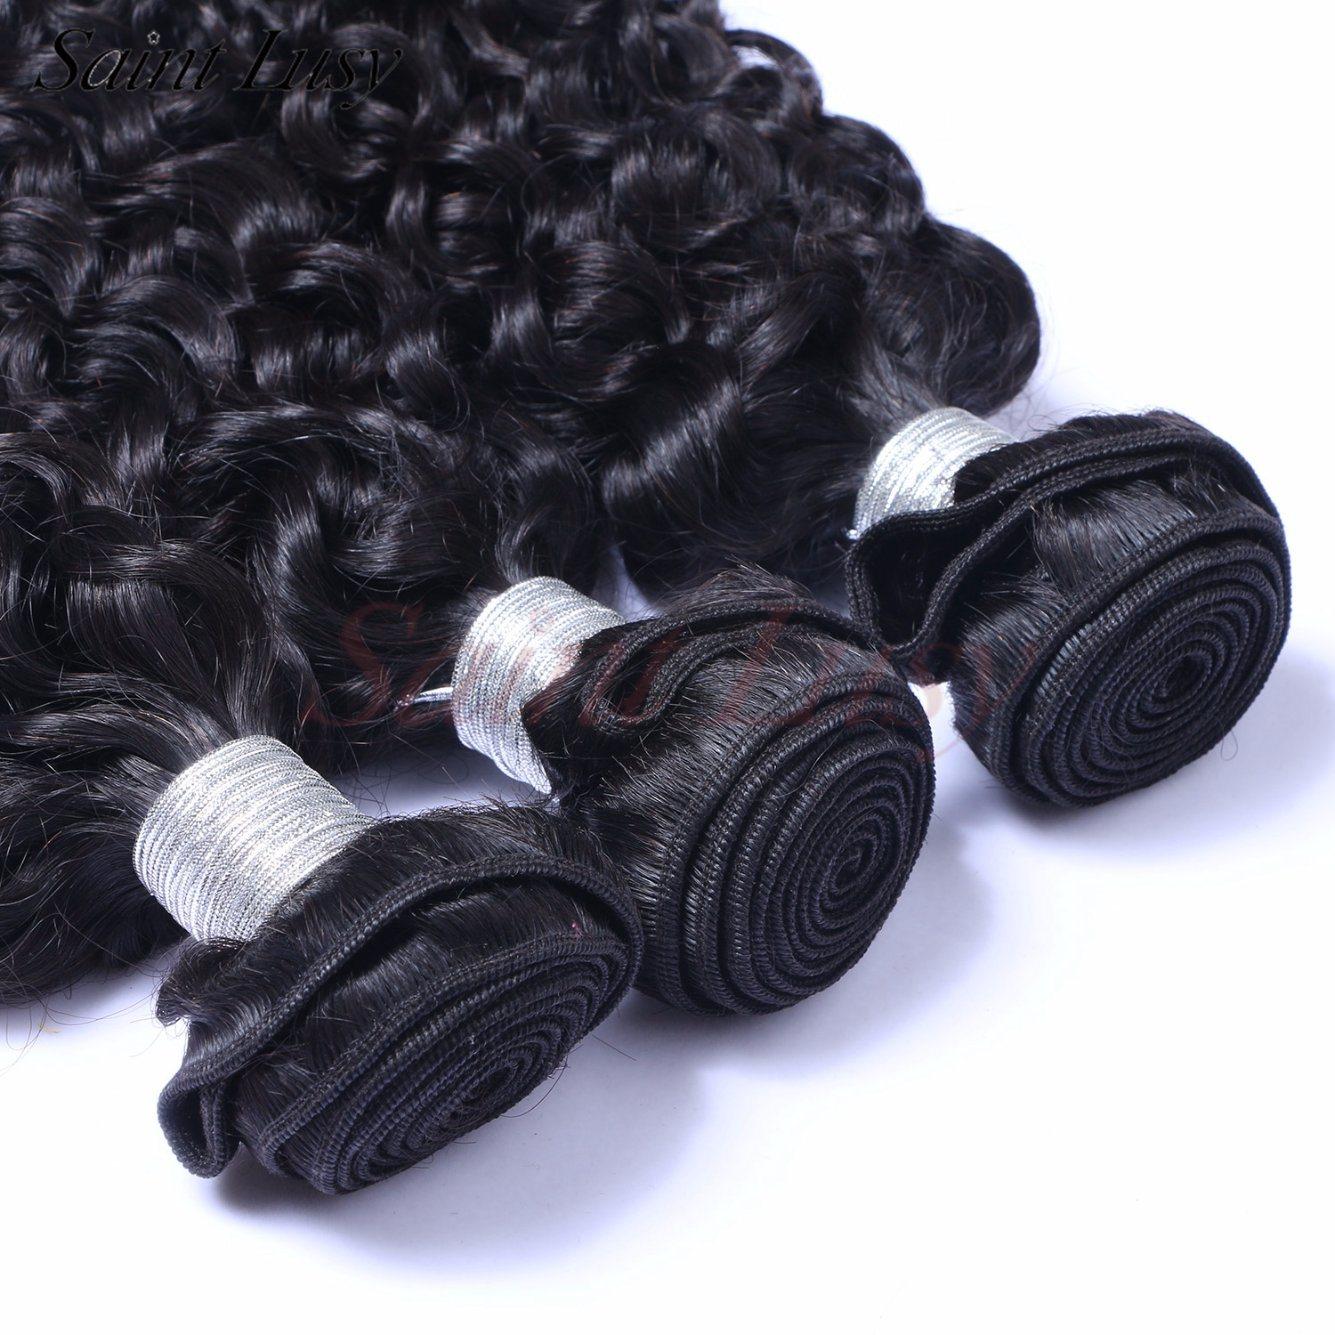 Wholesale Human Hair Extension Brazilian Remy Human Hair (SL-HE7A005)